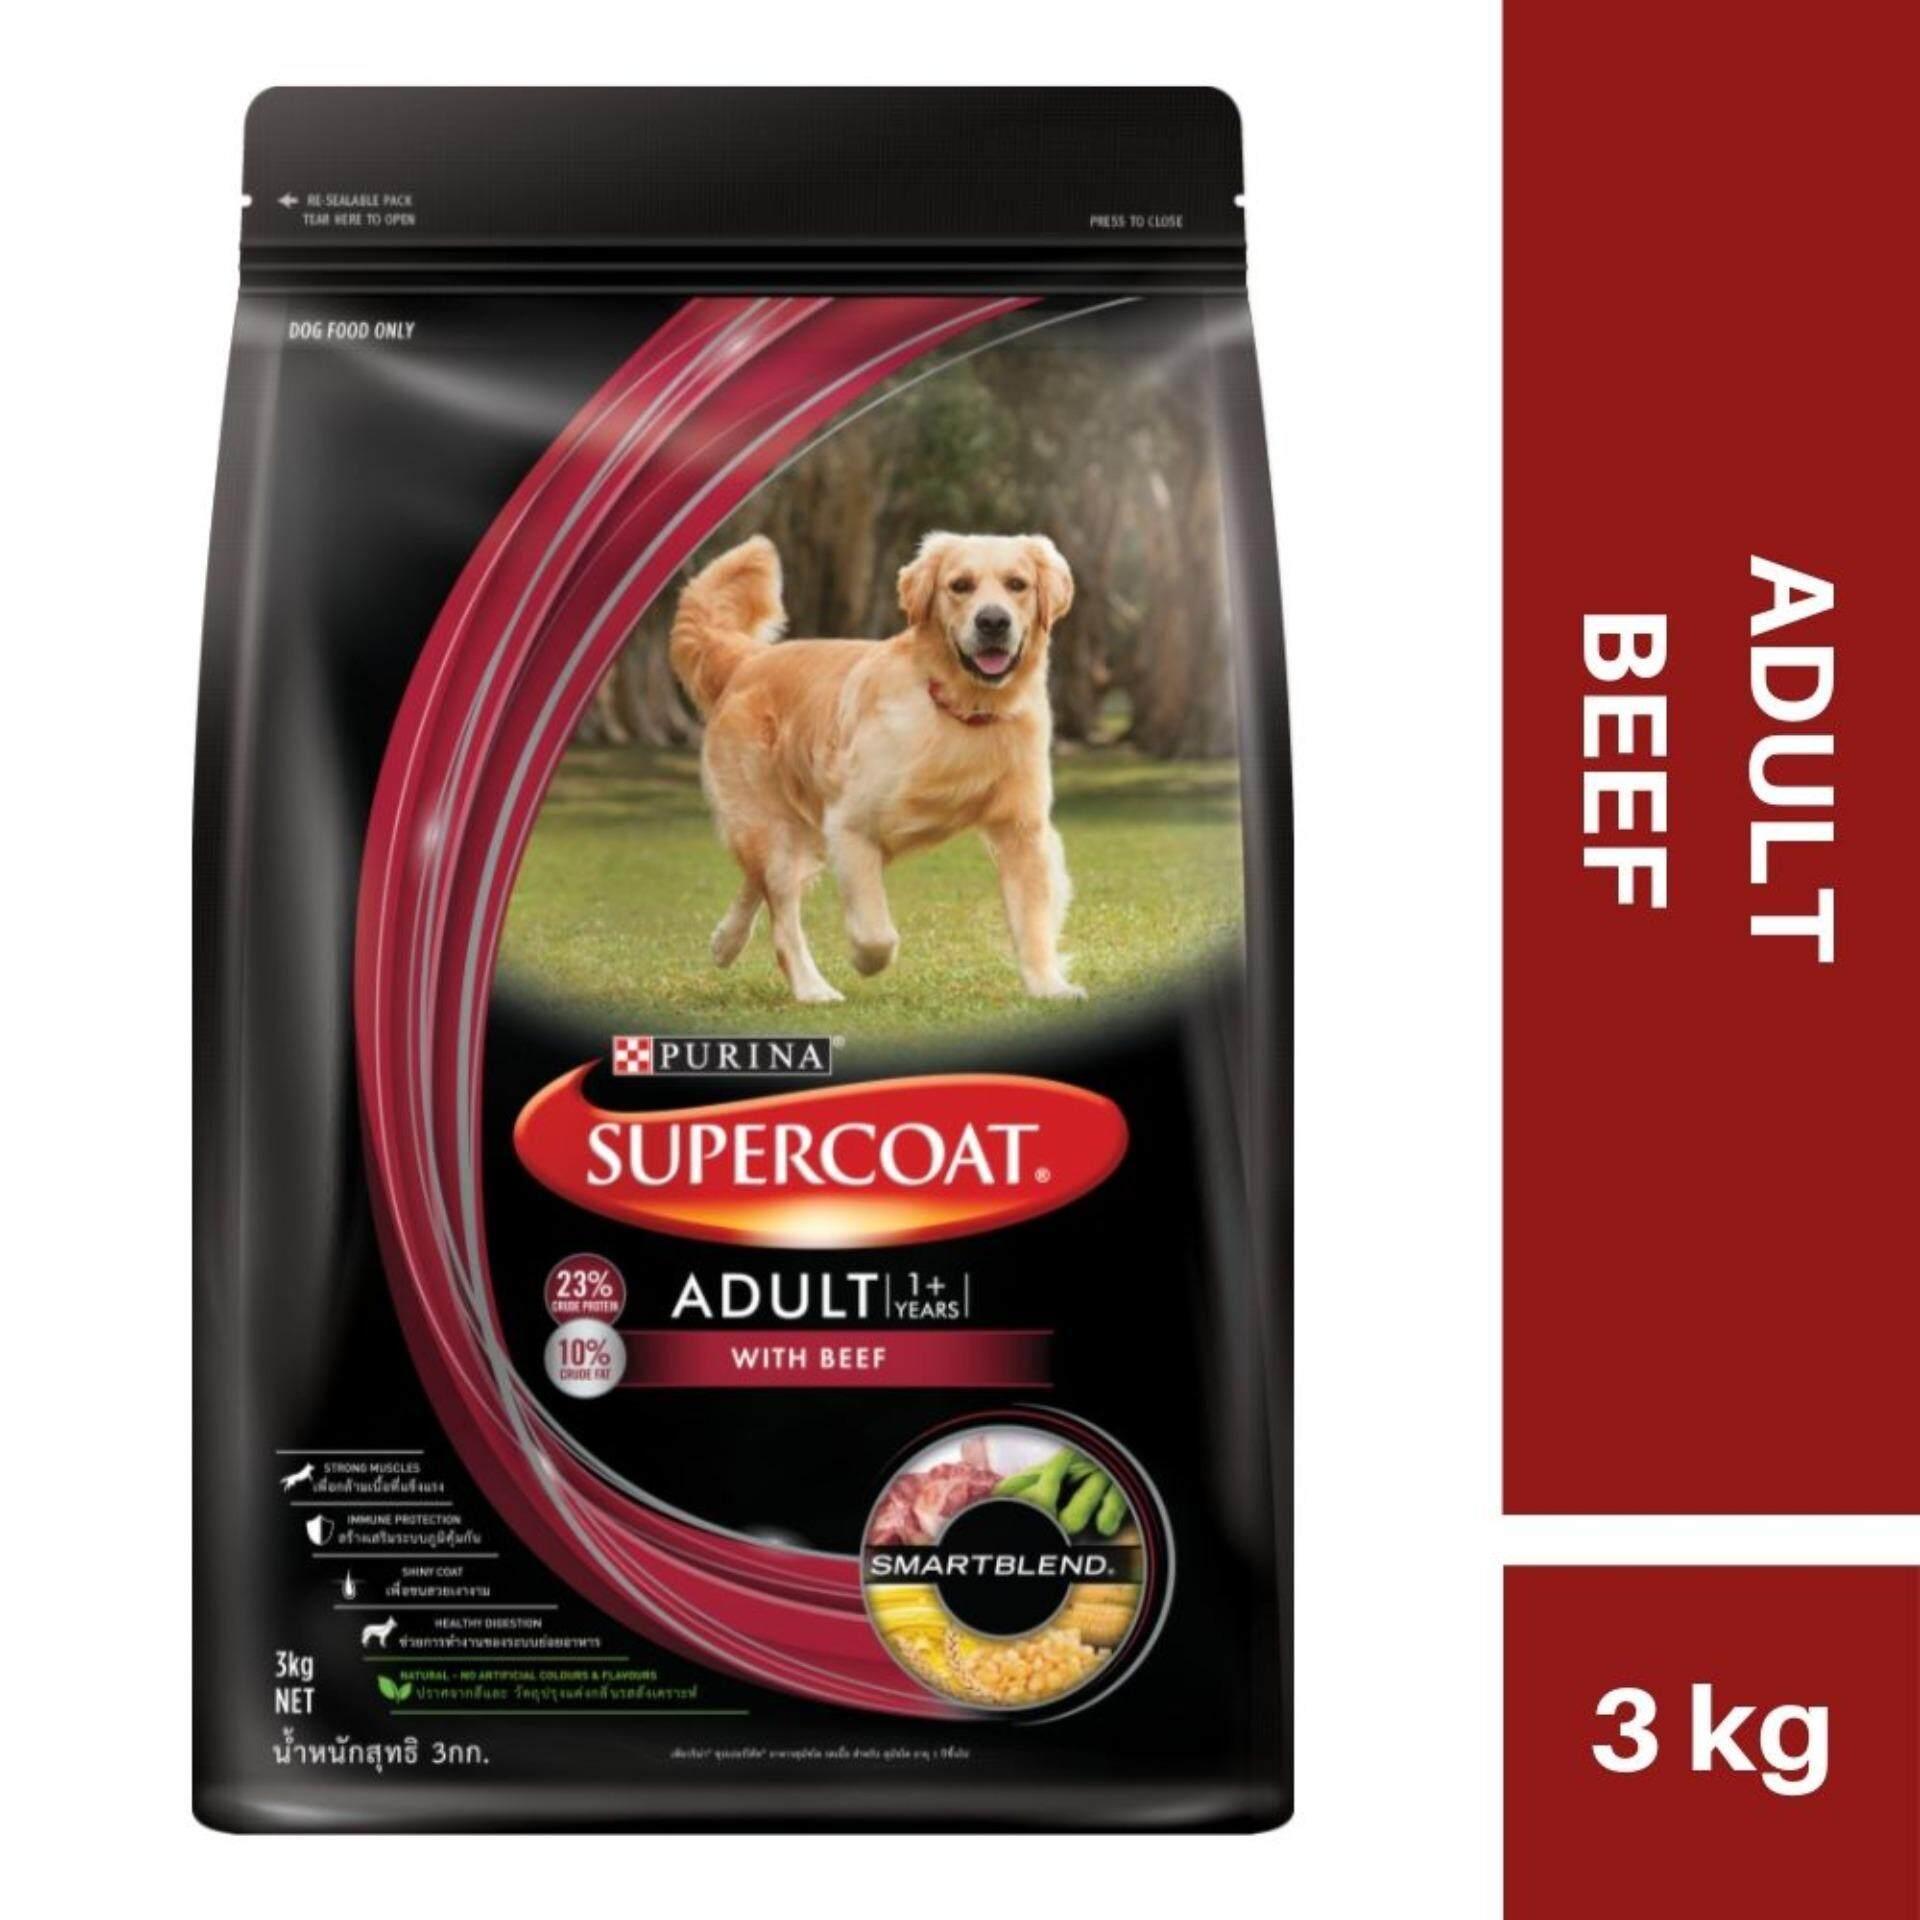 SUPERCOAT ADULT DOG FOOD Beef 3kg - Pet Food/ Dry Dog Food/ Makanan Anjing